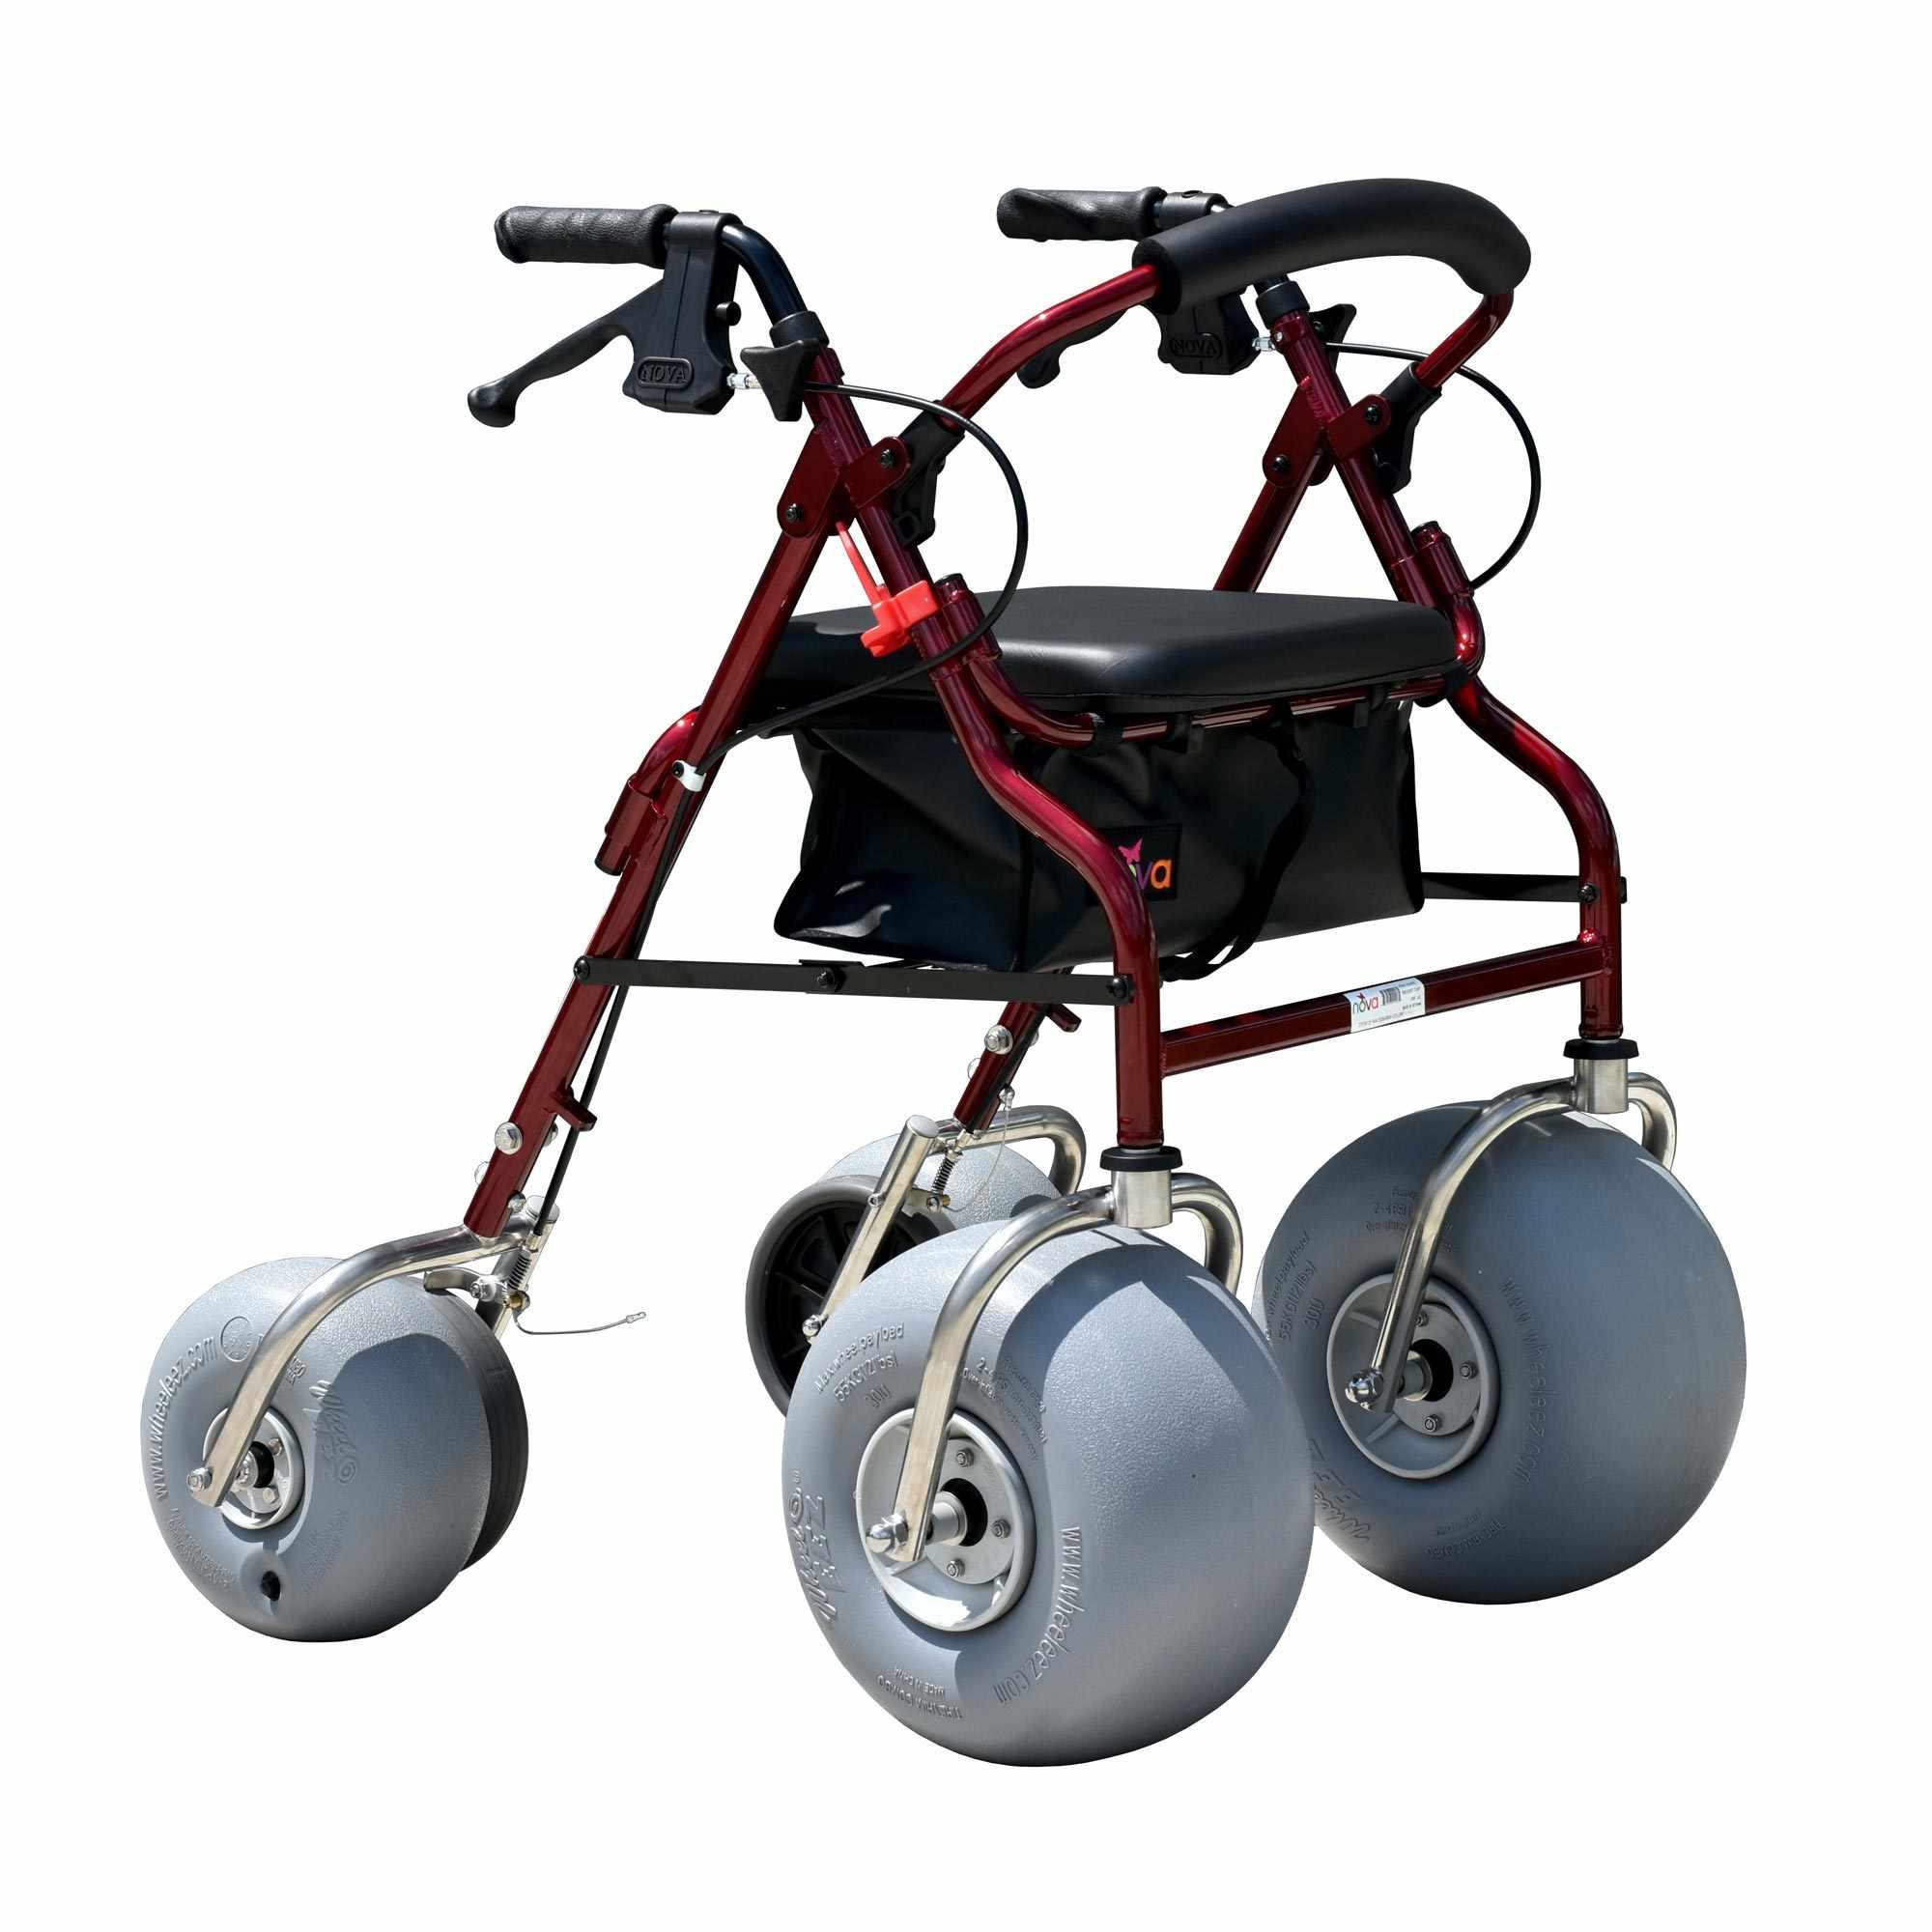 Aluminum all-terrain beach walker